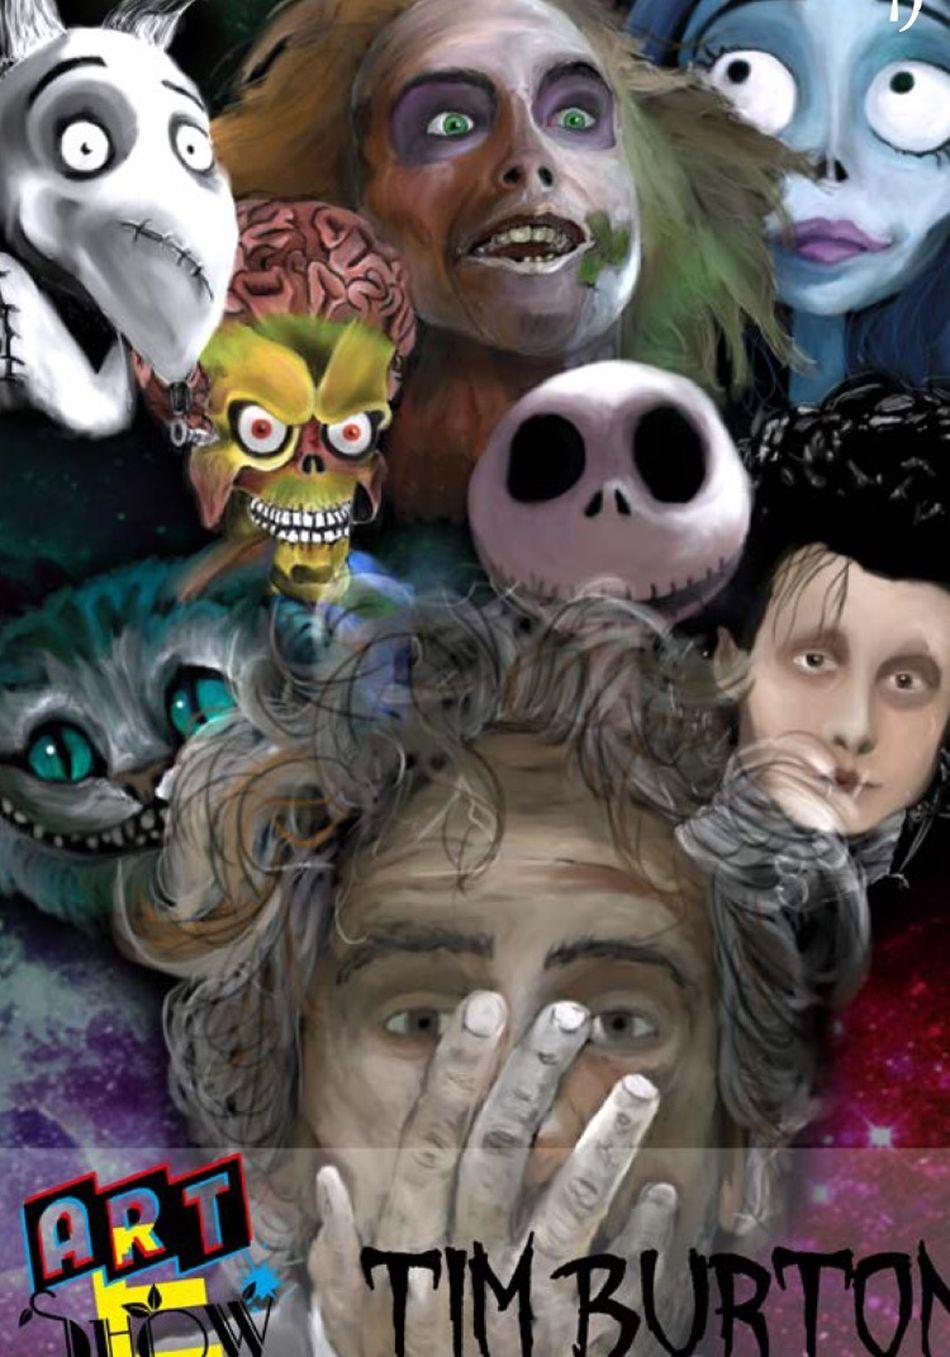 Couverture du premier numéro d'Art E Show Timburton Drawing Art Alice In Wonderland Edward Scissorhands Marsattack TheNightmareBeforeChristmas Beeteljuice Drawings Art, Drawing, Creativity Tablette Graphique